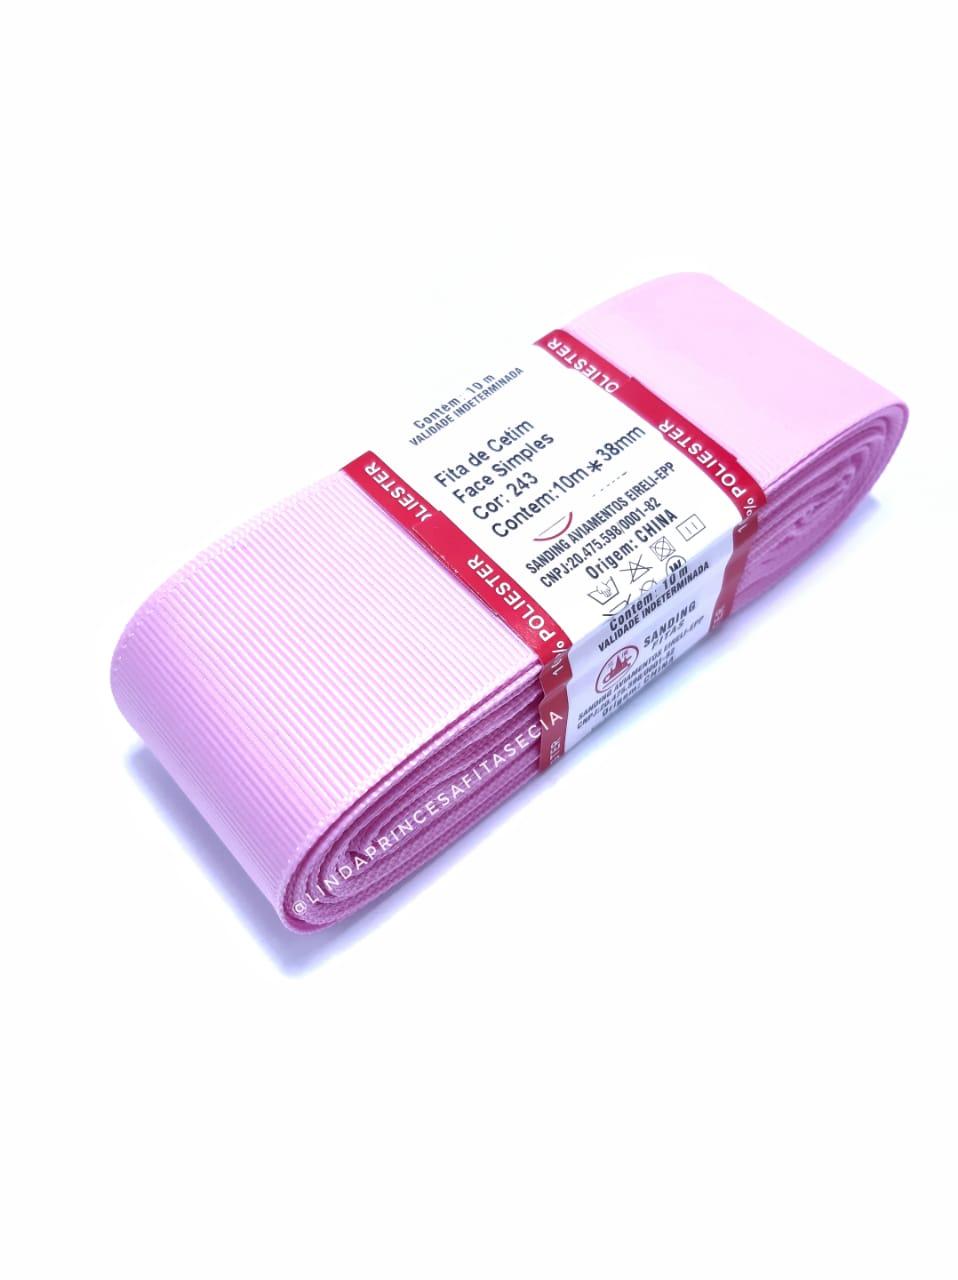 FITA SANDING - Cor: 243 Rosa Iogurte